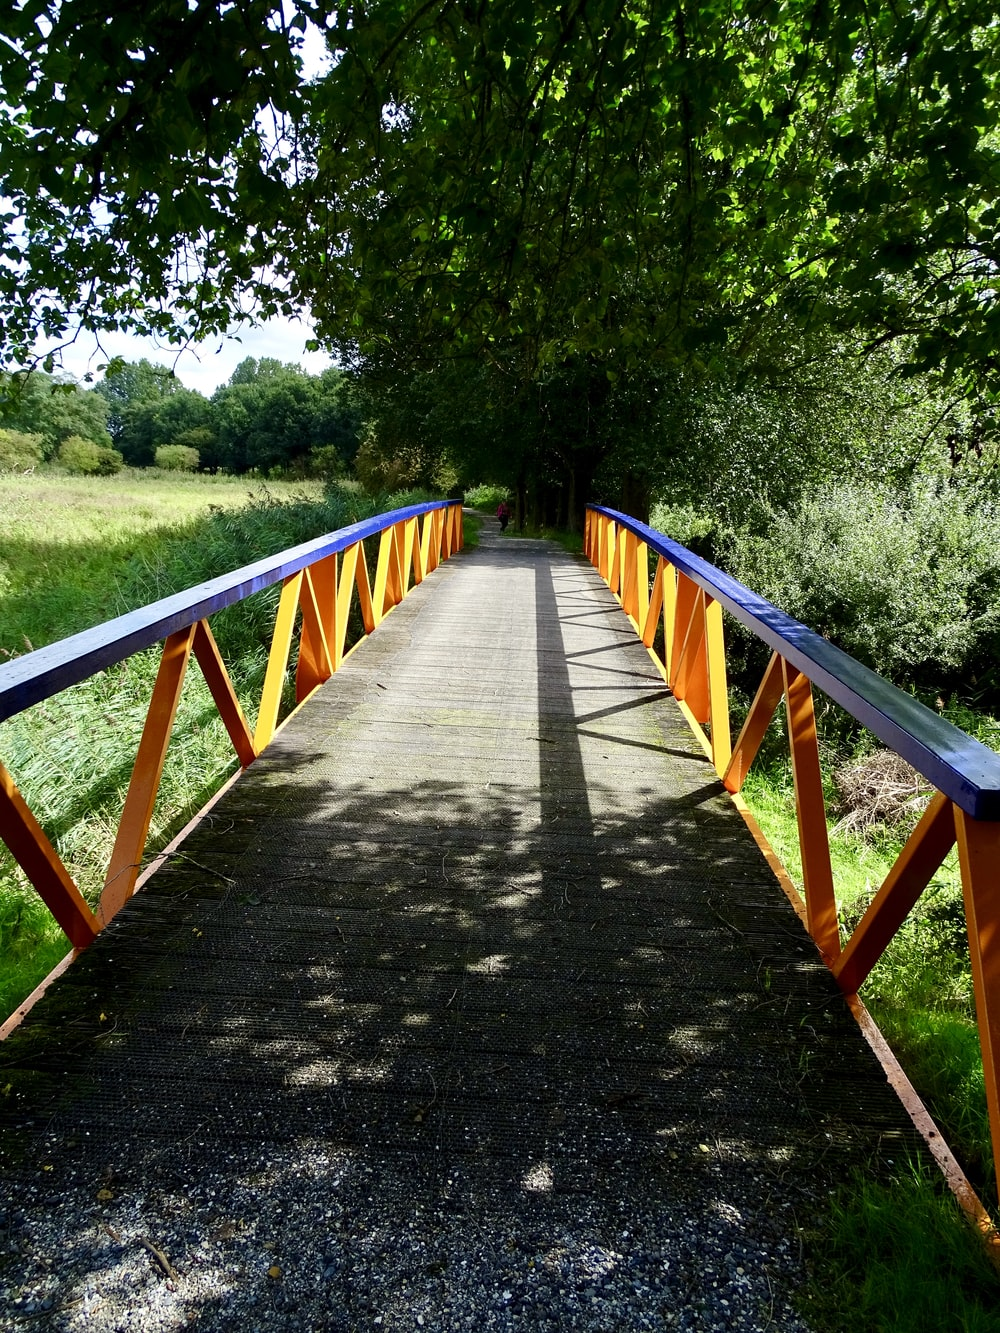 brown wooden bridge in between green trees during daytime